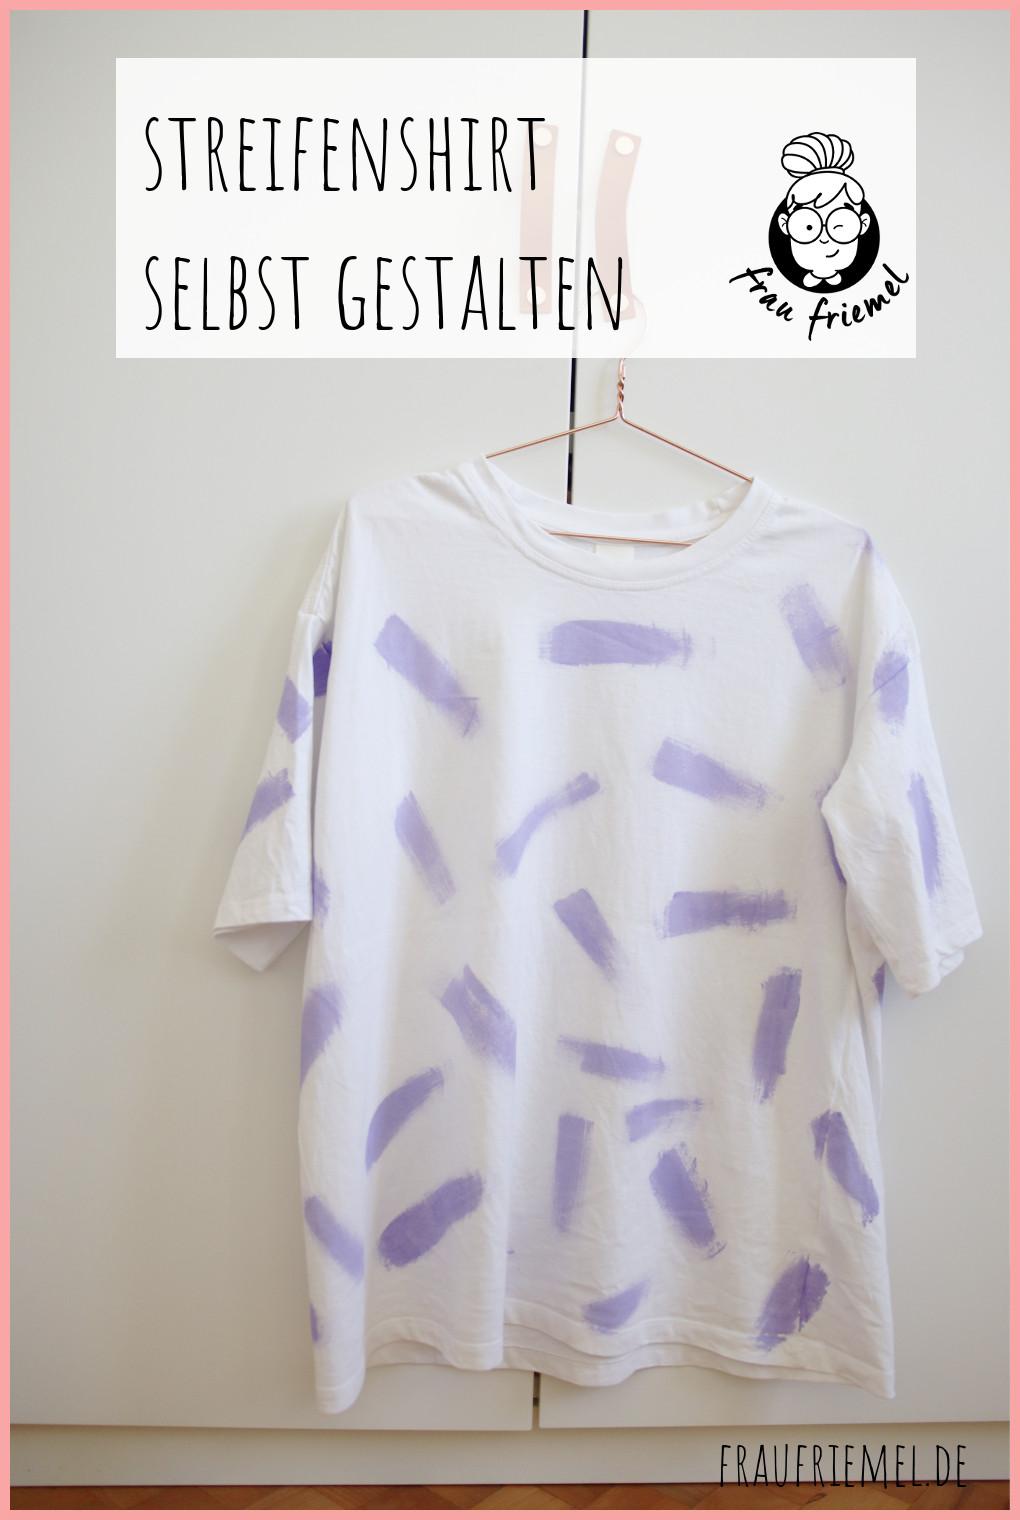 T-Shirt selber gestalten auf Pinterest merken